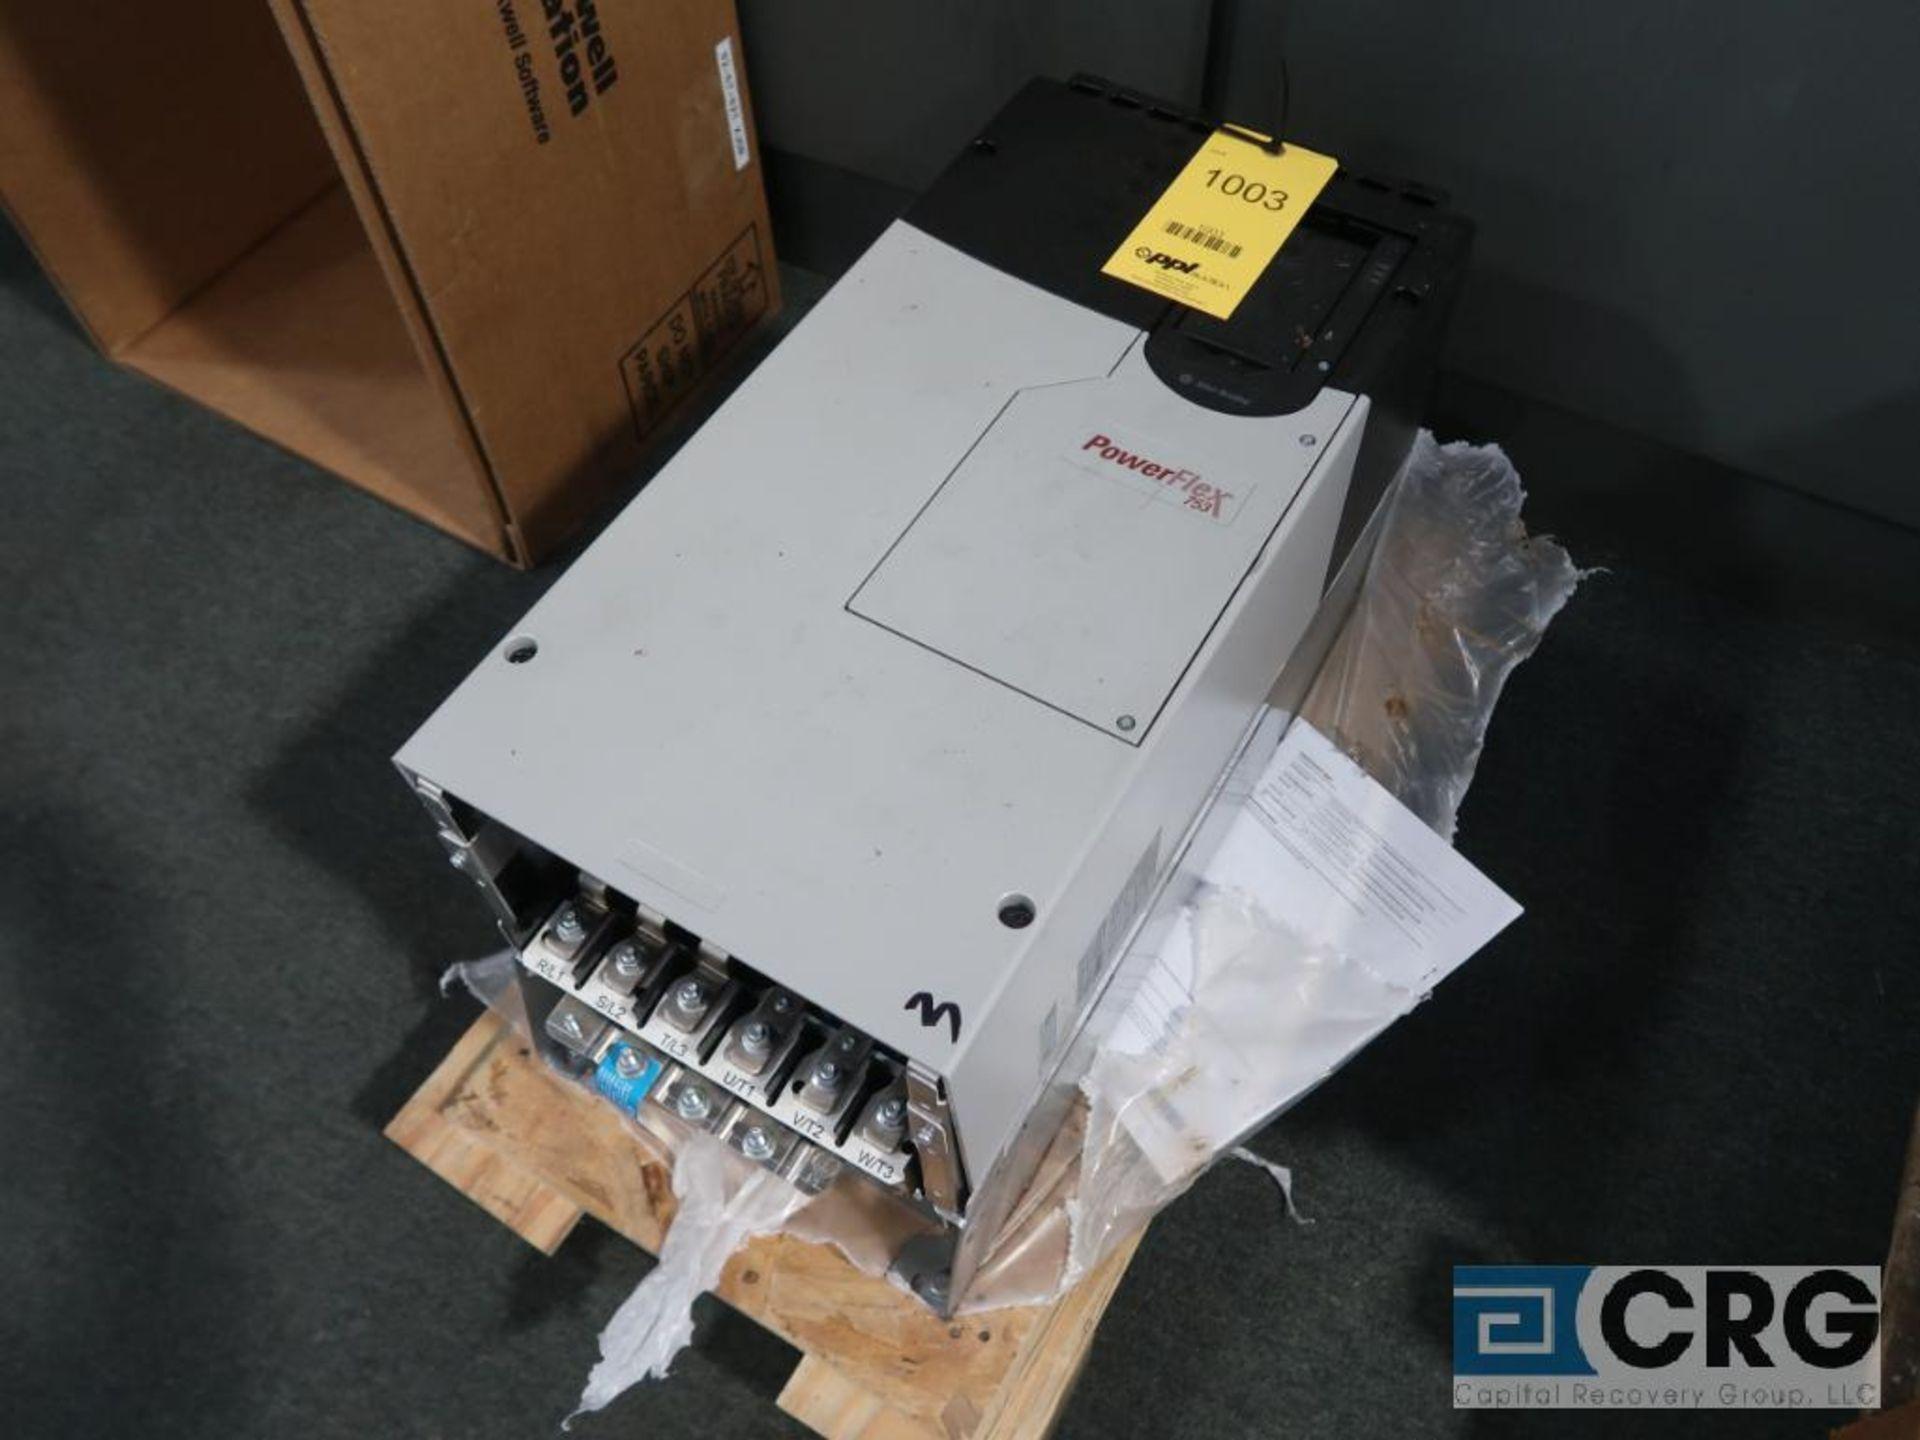 Allen Bradley Power Flex 753 150 HP variable frequency drive, 480 volt, s/n 67283828 (Finish